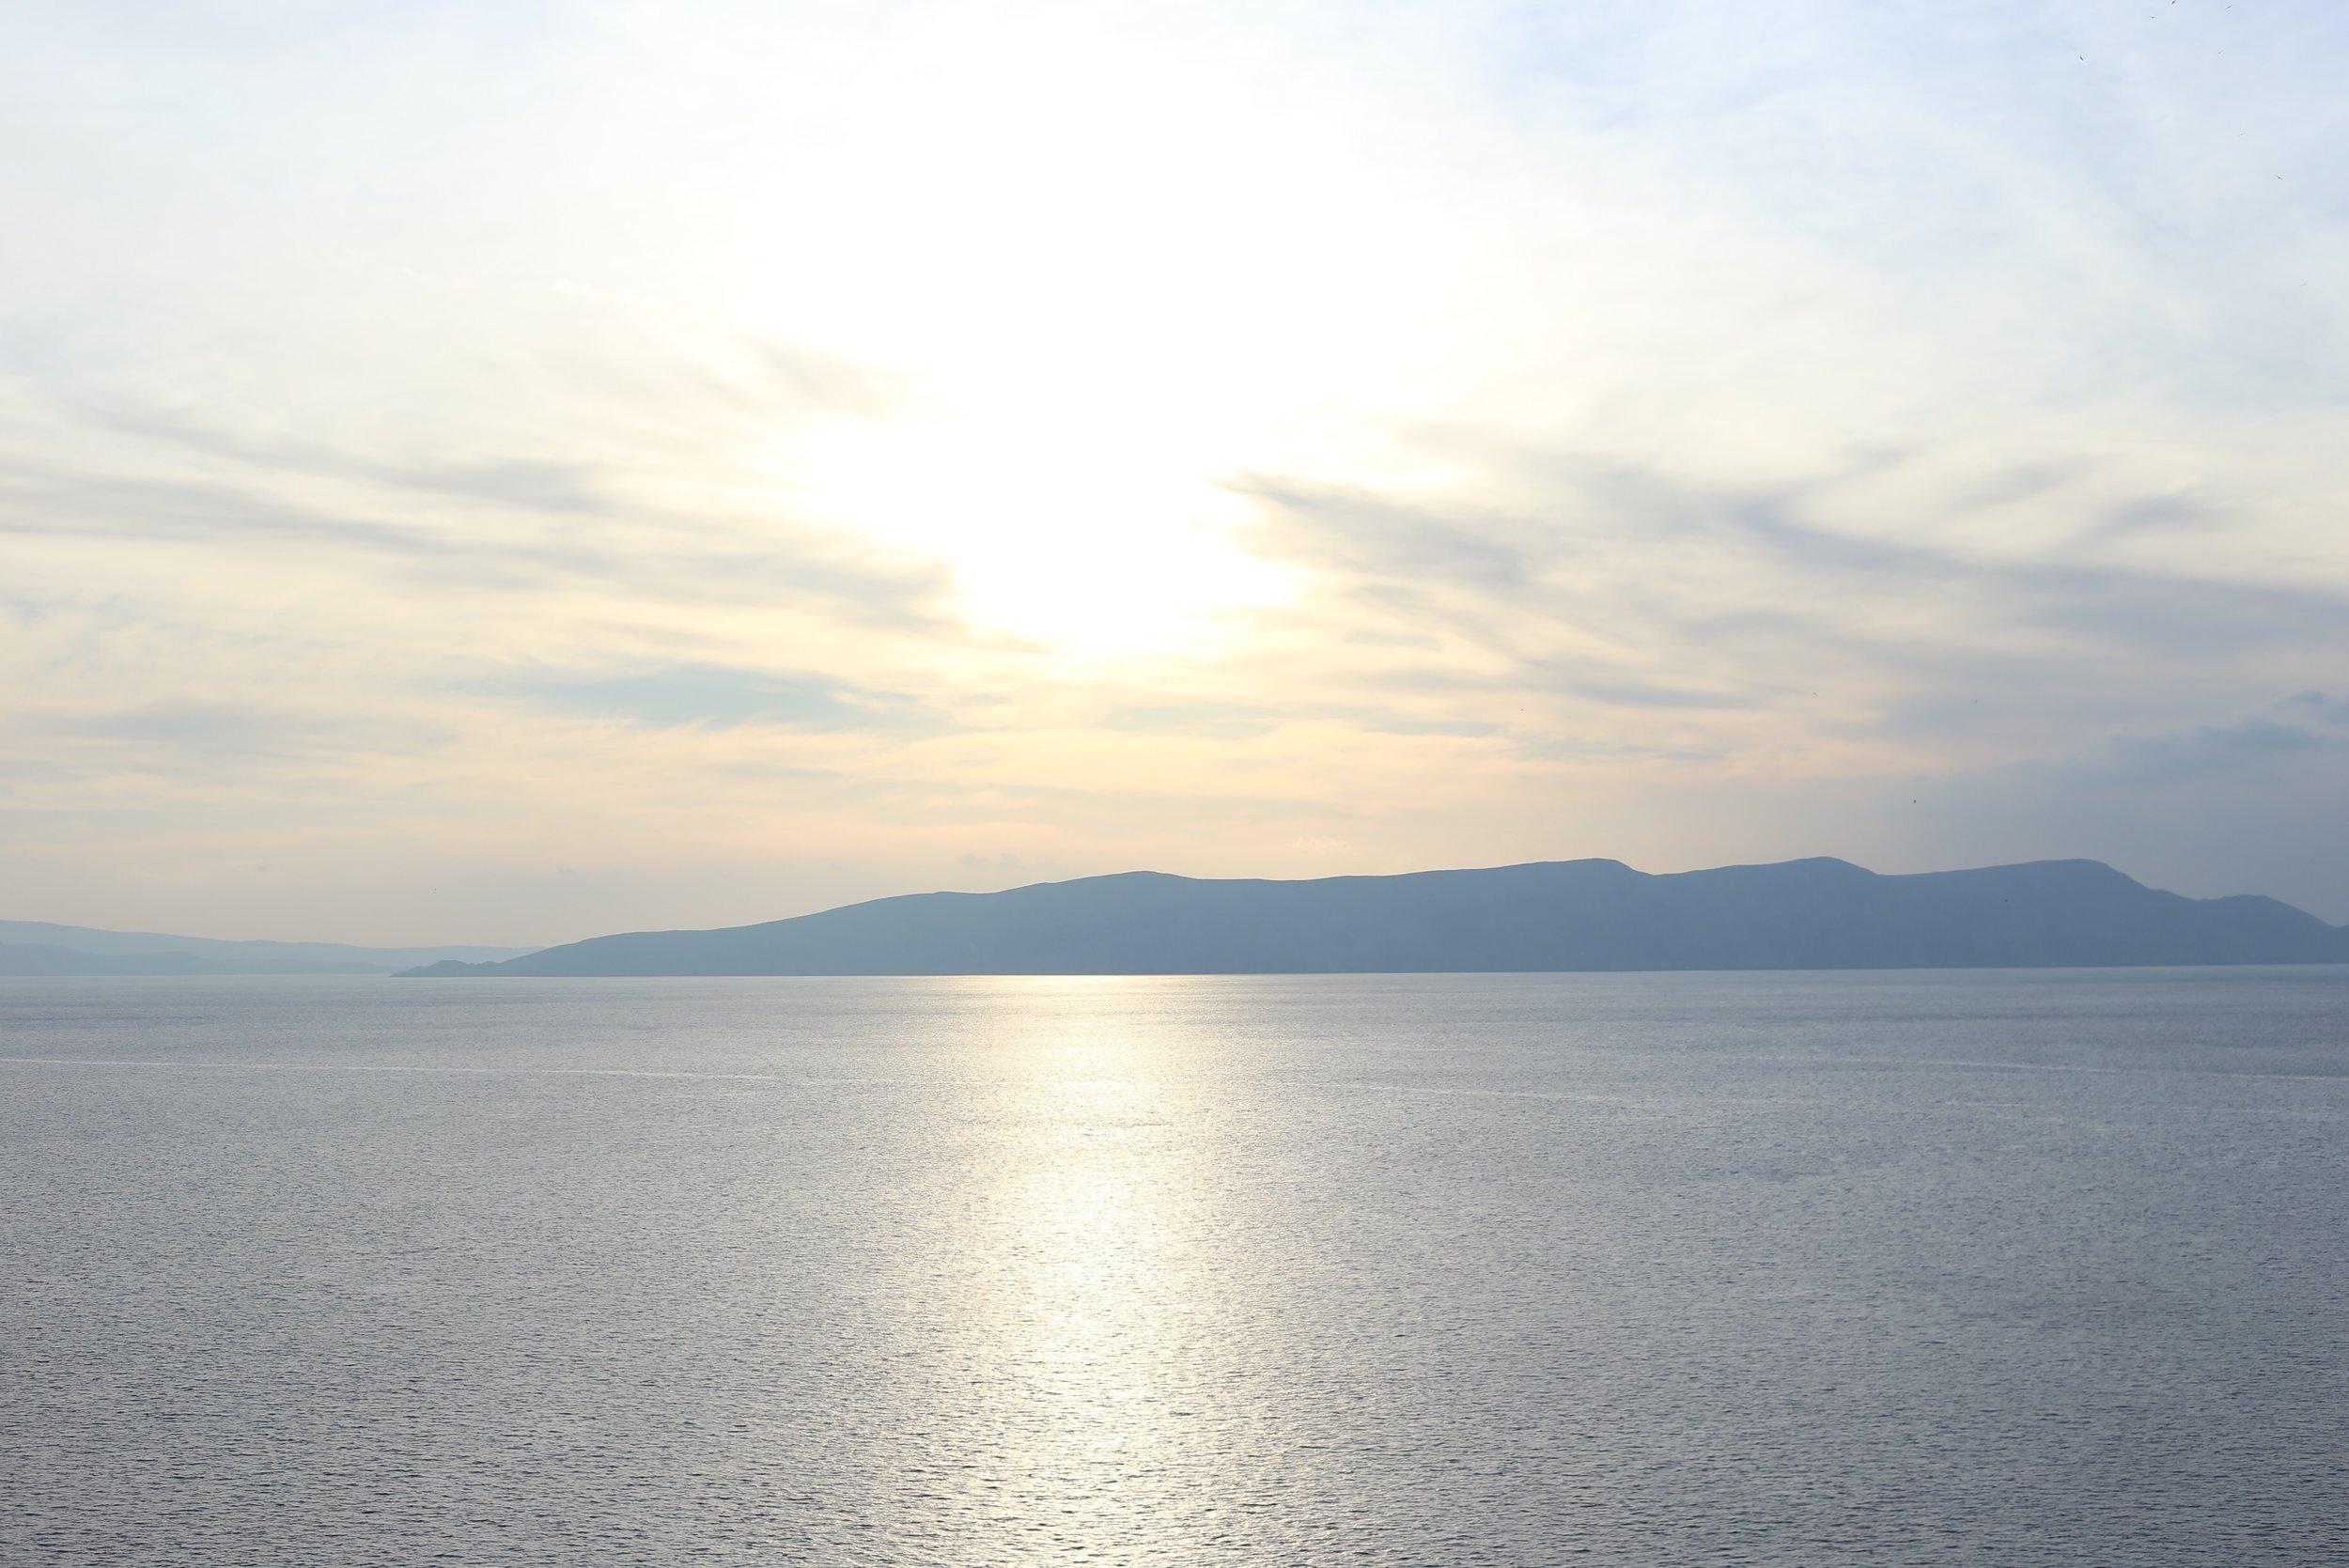 Calm seas at sunset.